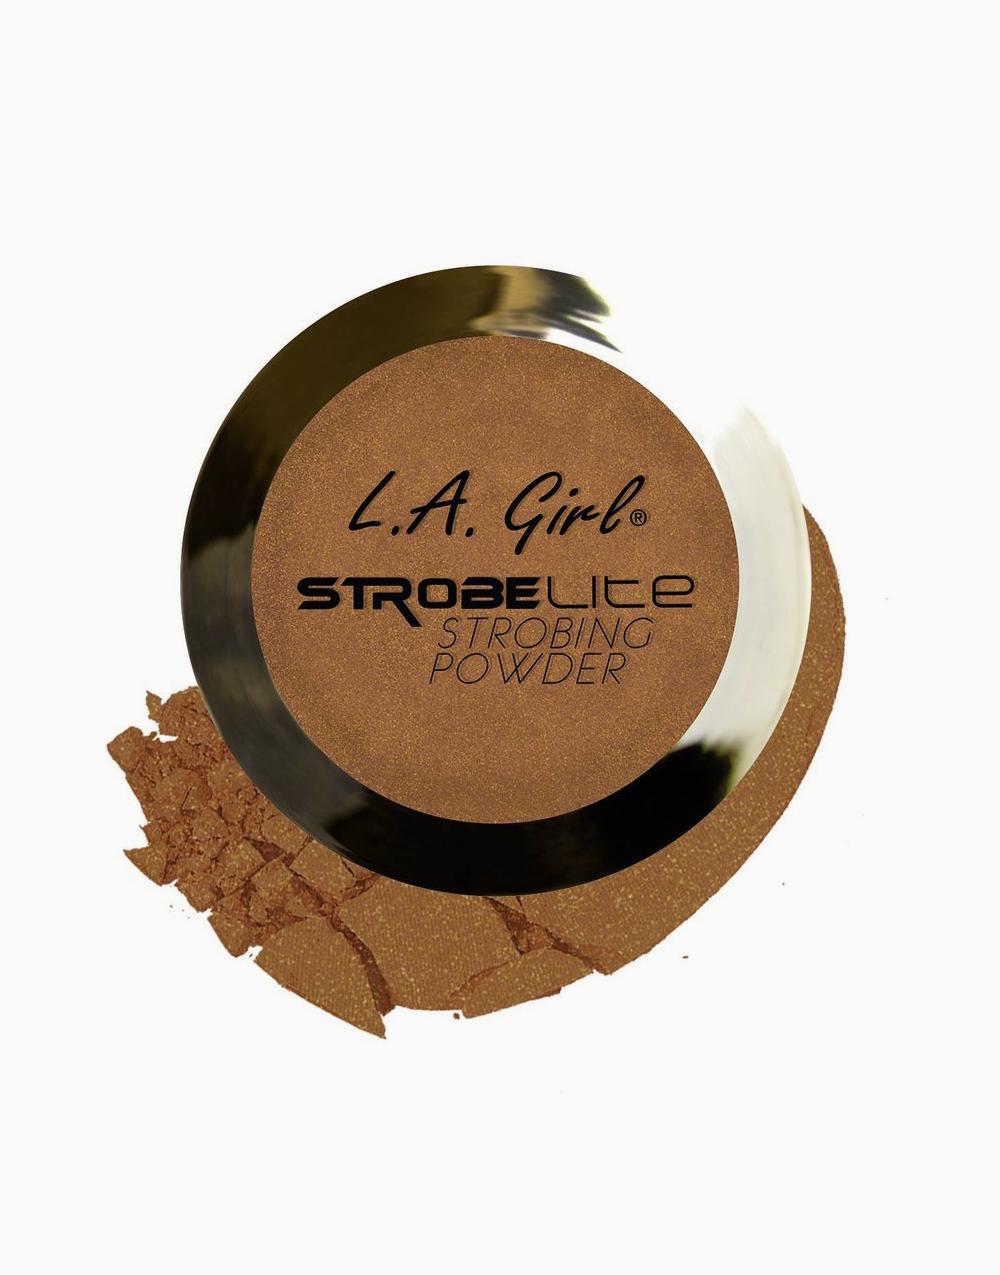 Strobelite Strobing Powder by L.A. Girl | 20 WATT